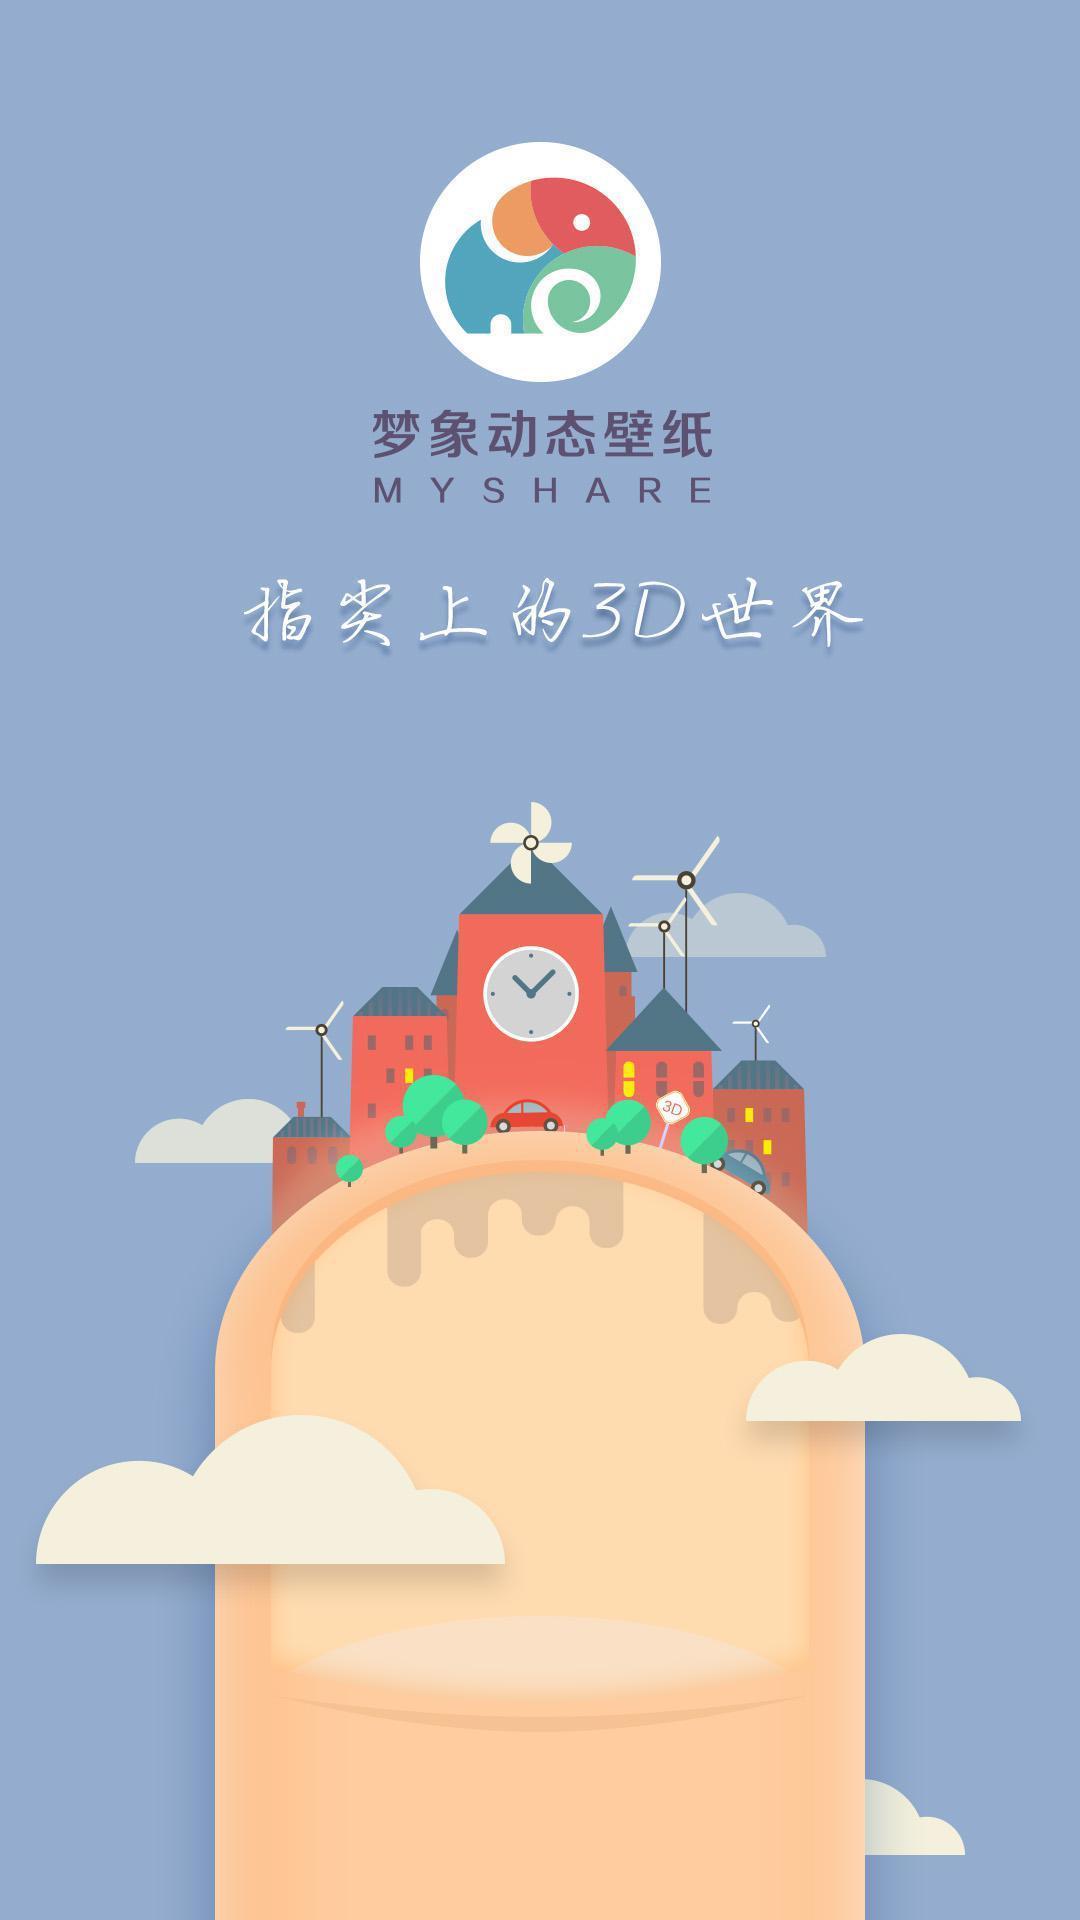 3D碧海蓝天-梦象动态壁纸